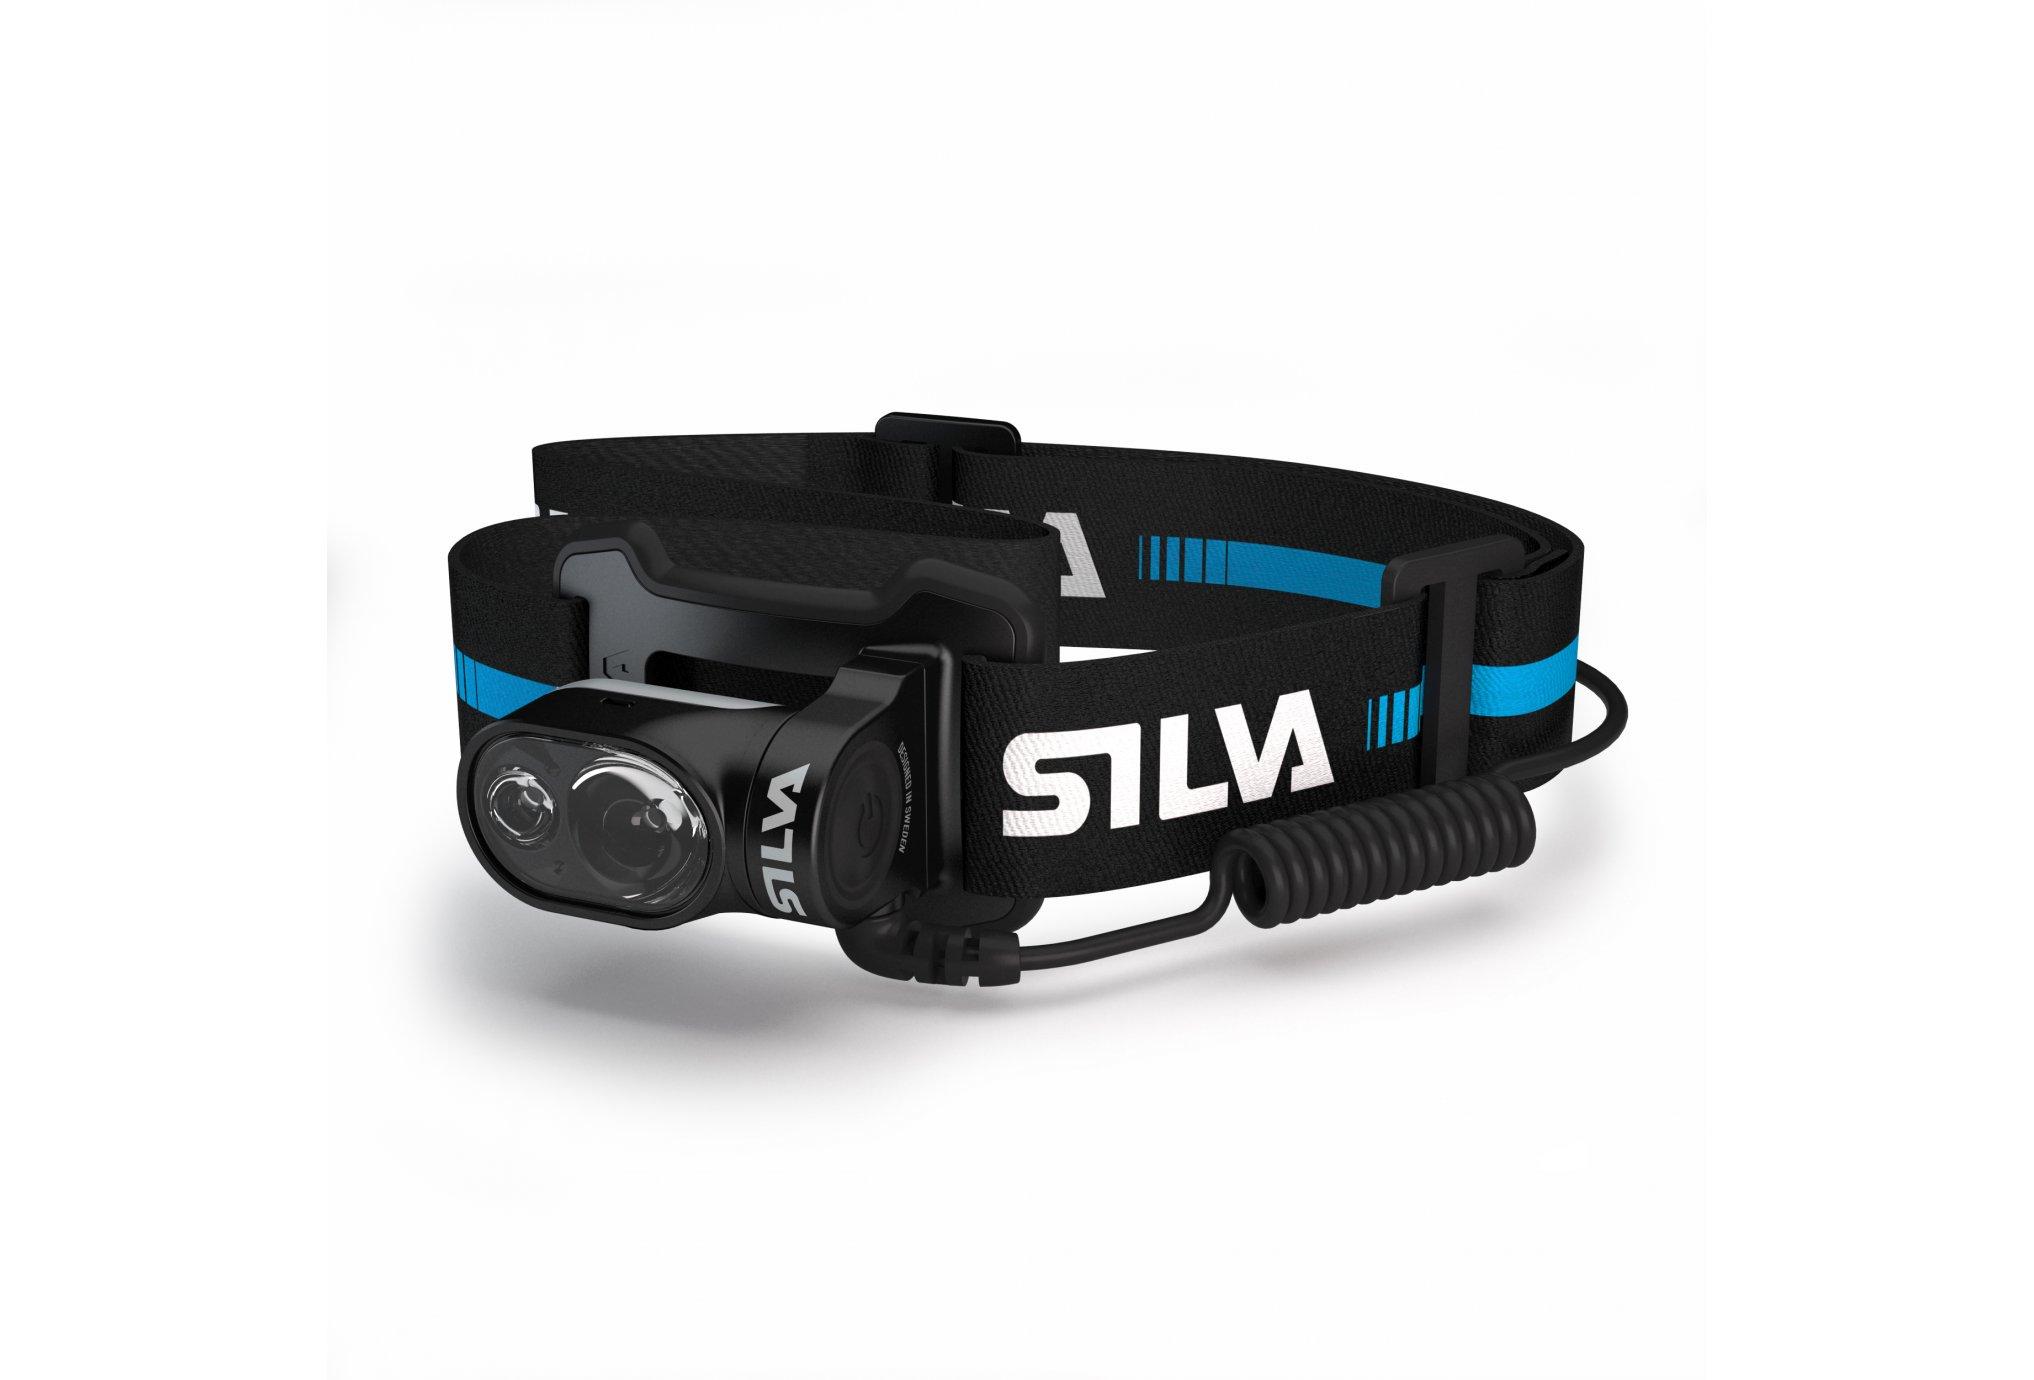 Silva Cross Trail 5X Lampe frontale / éclairage